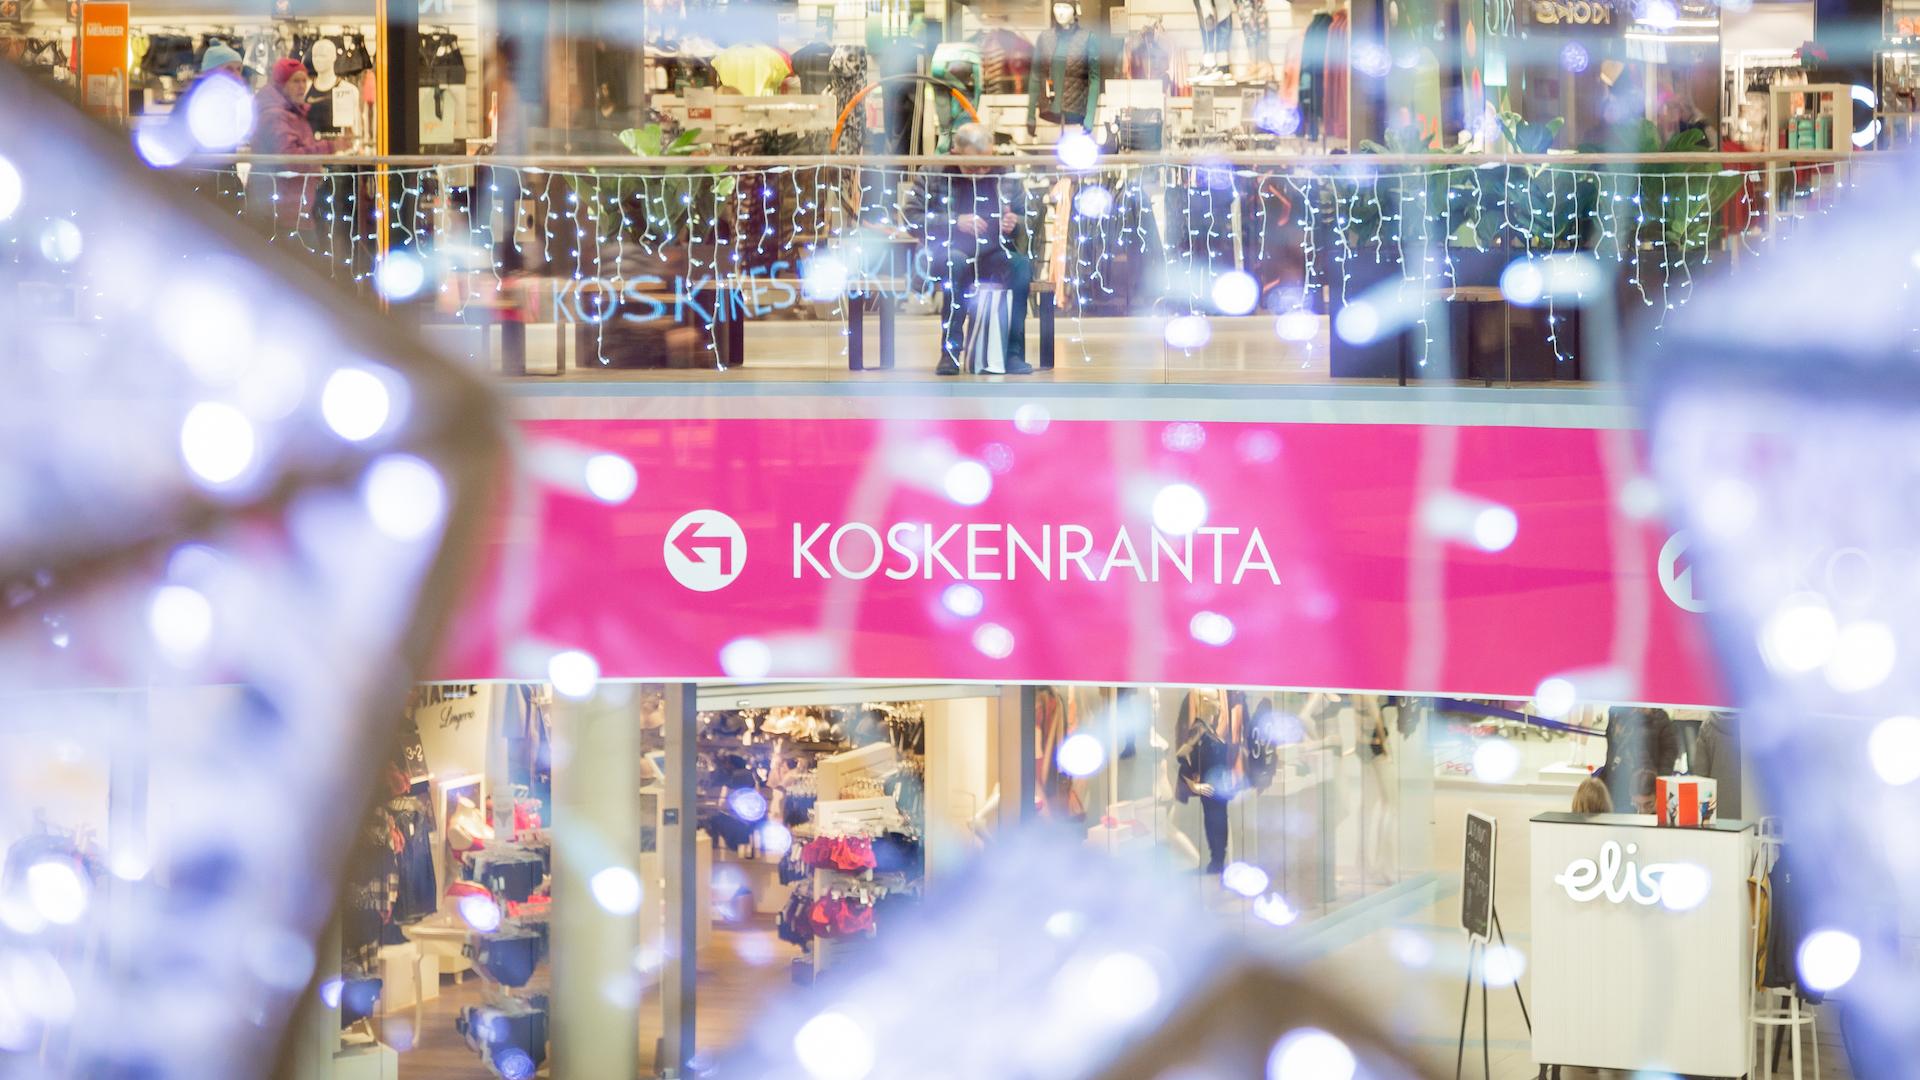 Business Tampere Koskikeskus